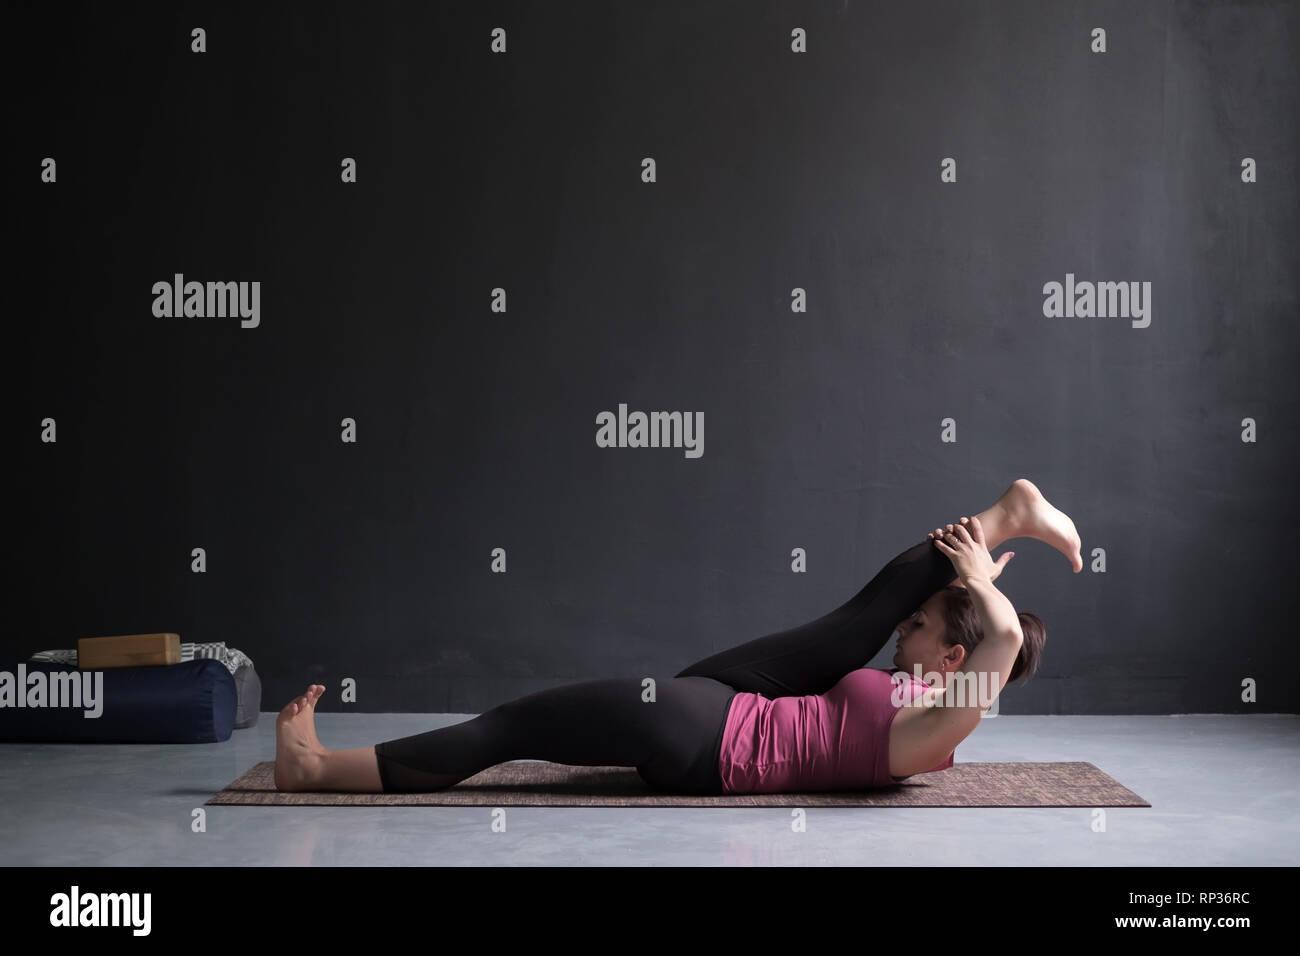 Woman doing Yoga asana Supta padangusthasana or reclining hand to big toe pose - Stock Image